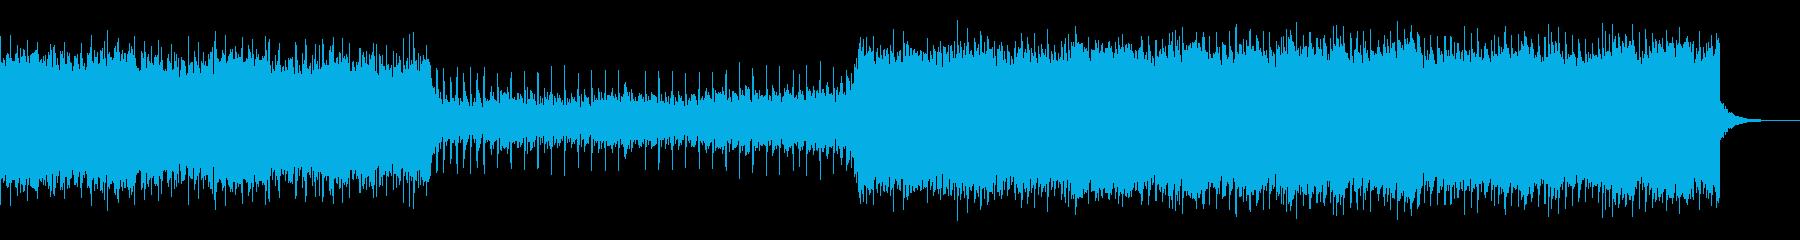 80's風のエレクトロBGMの再生済みの波形